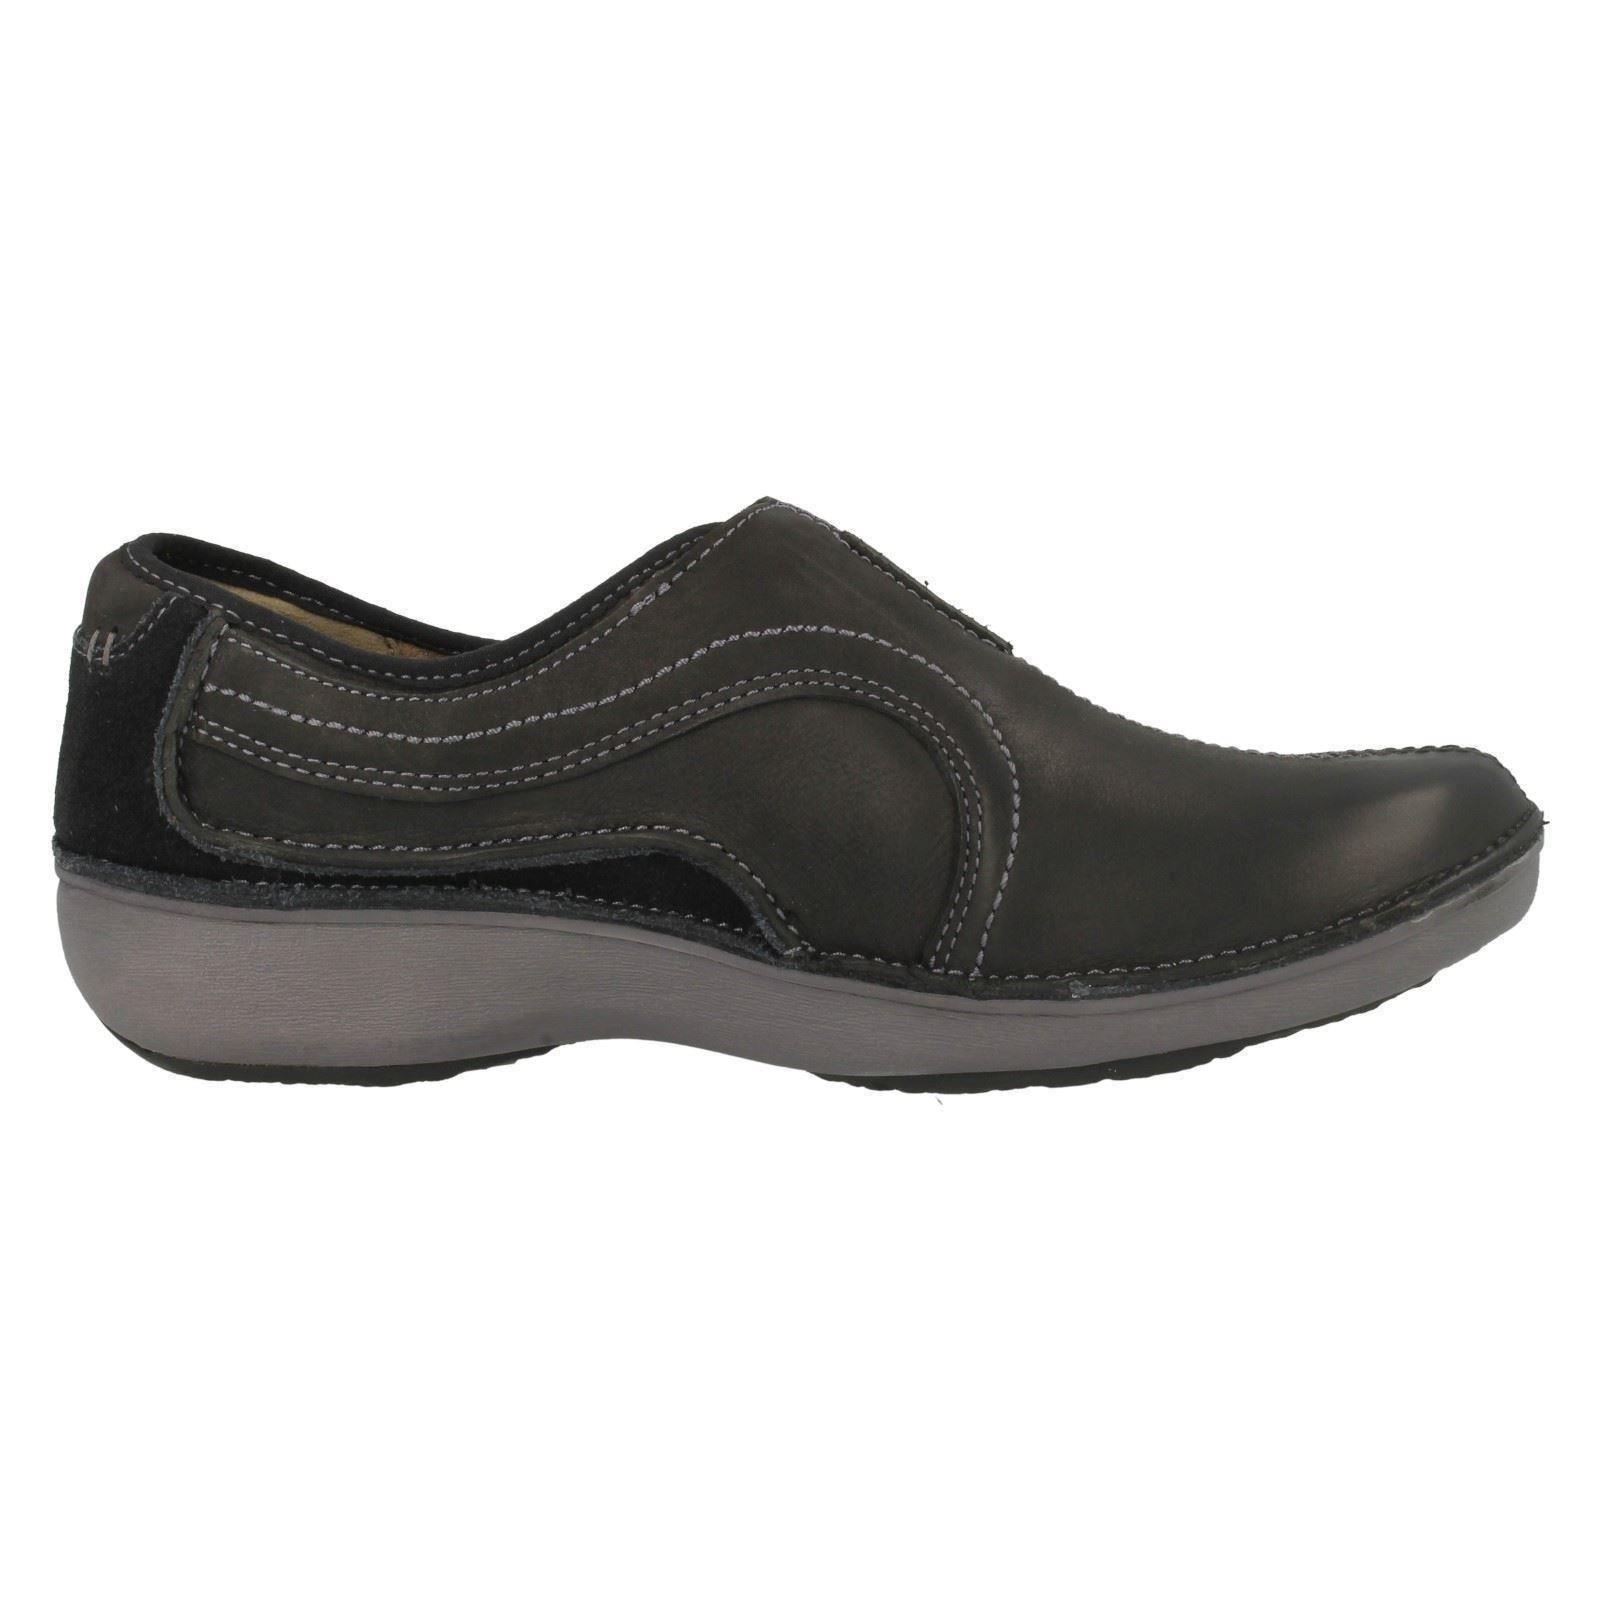 Clarks Wave Walk Womens Shoes Size